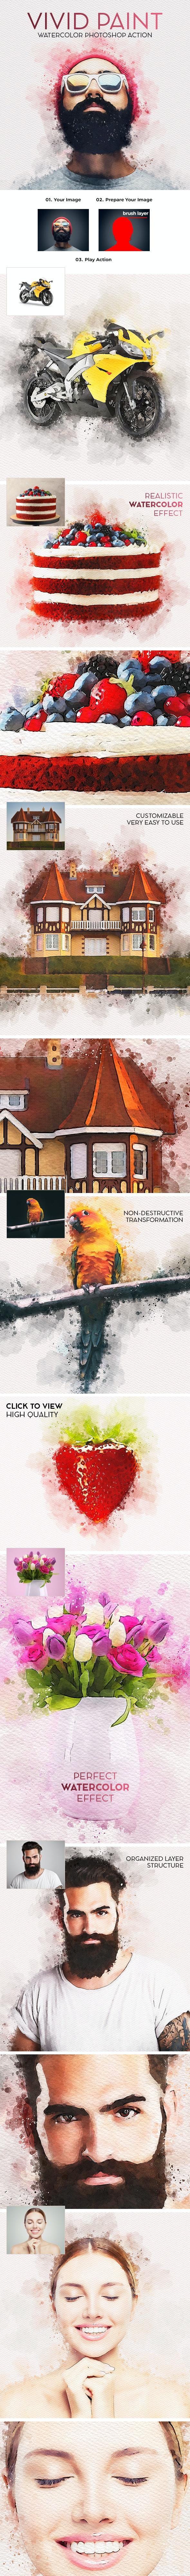 Vivid Paint - Watercolor Photoshop Action - Photo Effects Actions